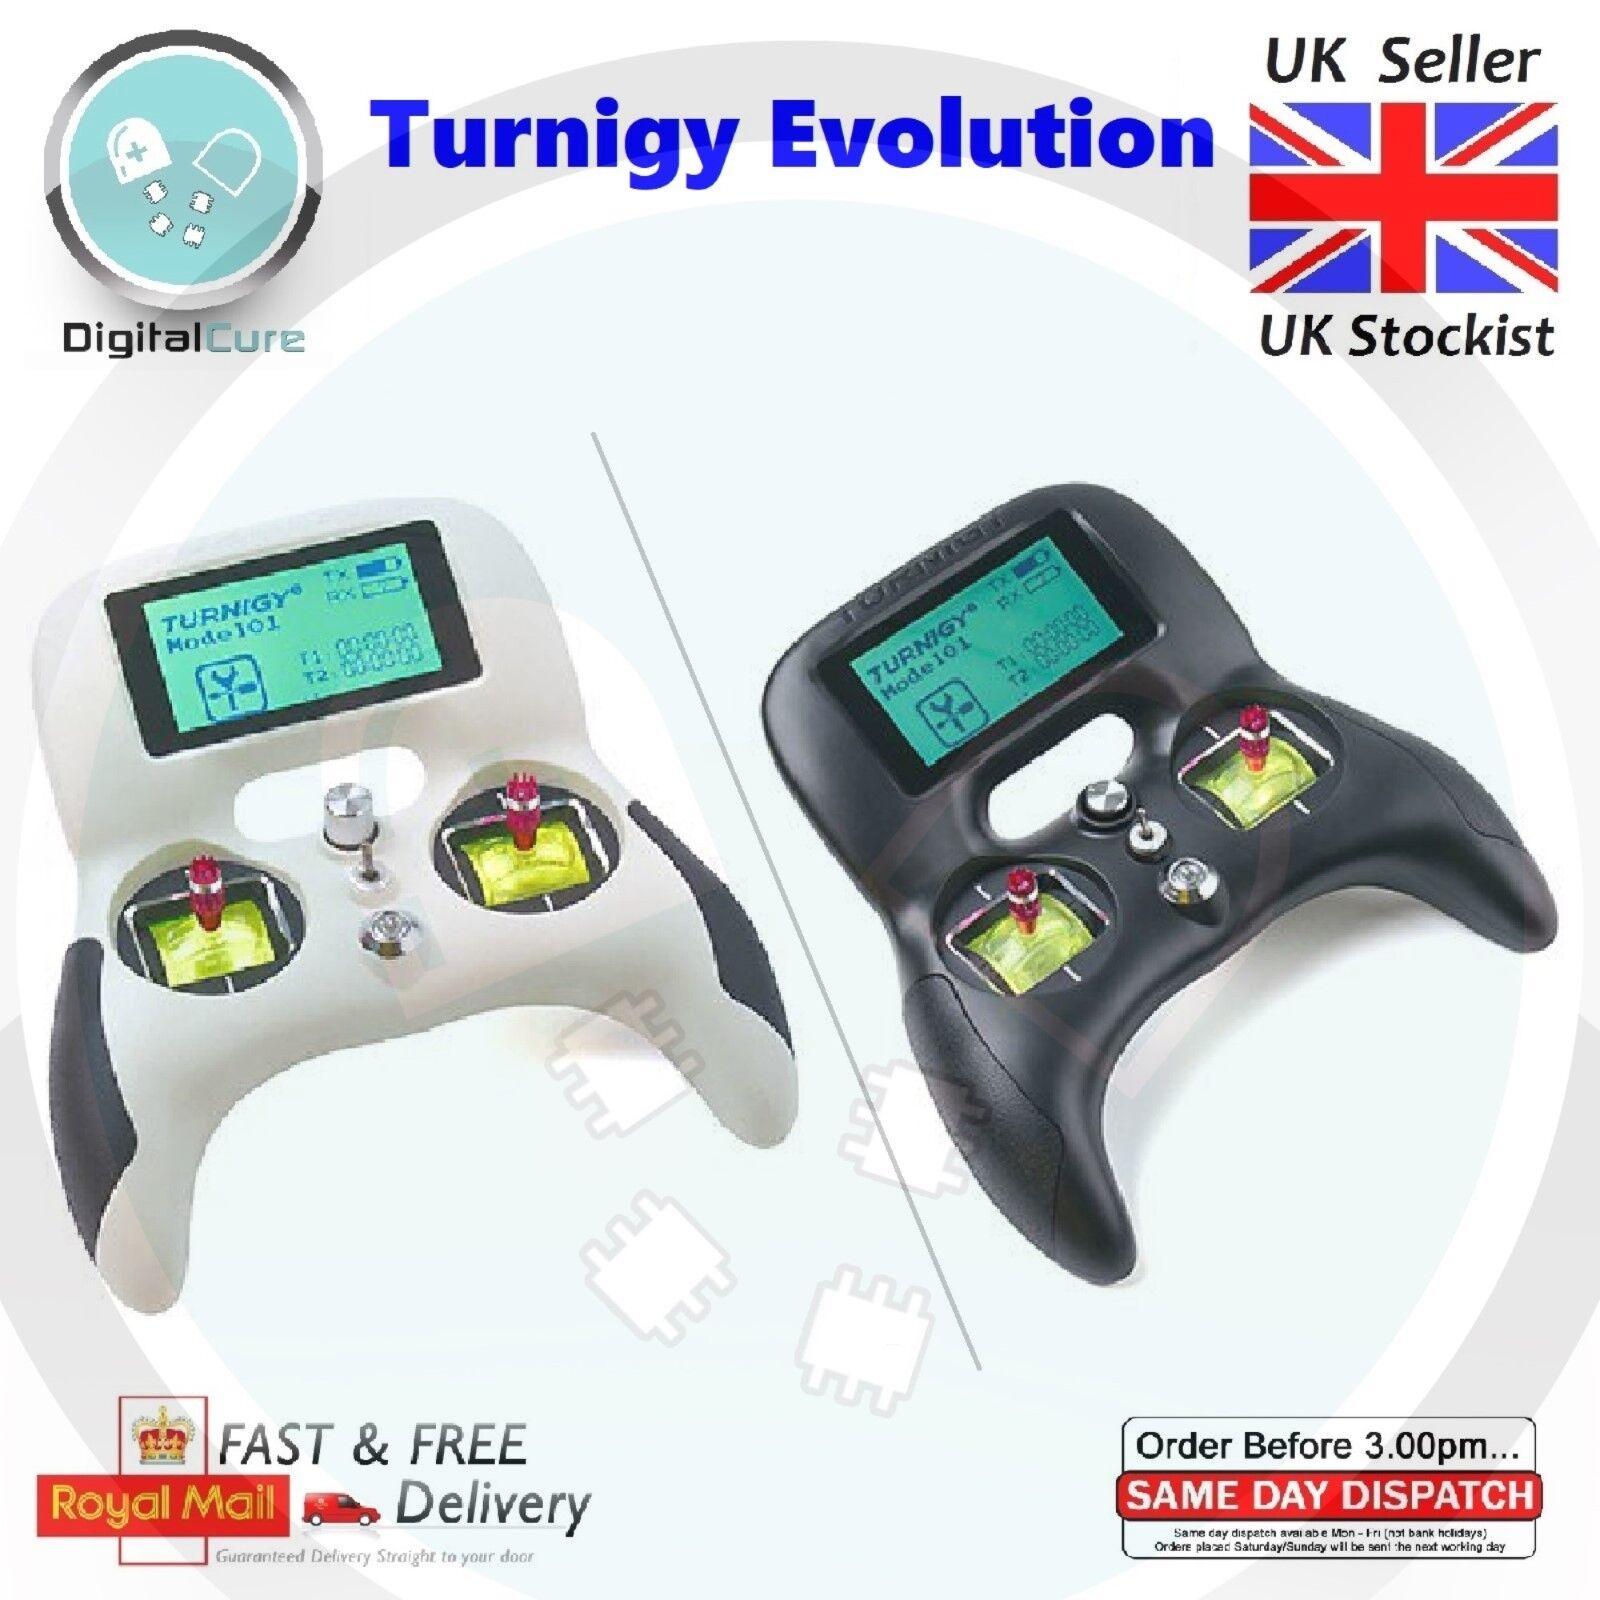 Turnigy Evolution Digital AFHDS 2A Mode 2 Radio Transmitter + TGY-iA6C Receiver